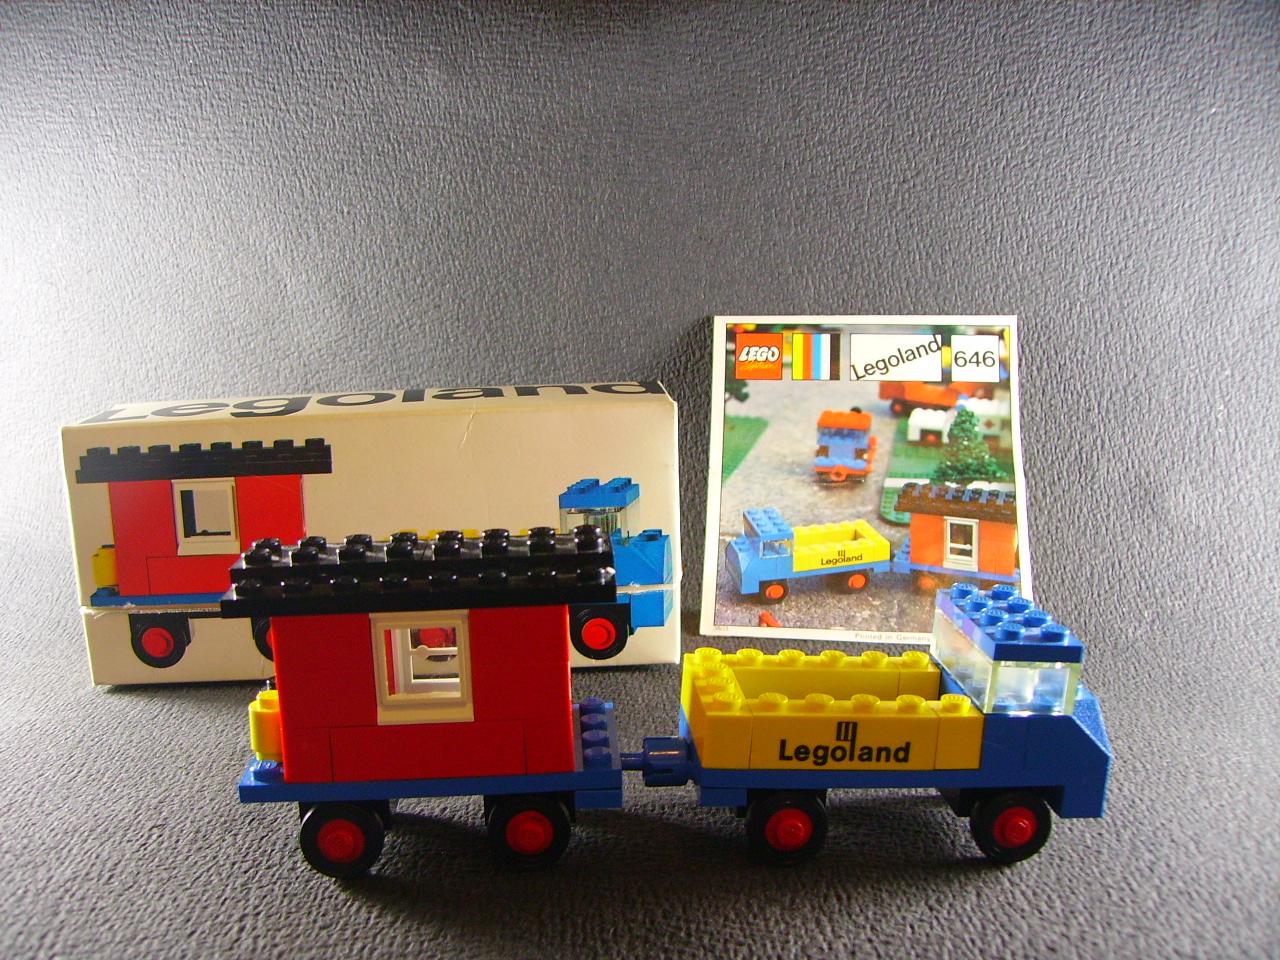 lego system vintage legoland 646 camion baraque chantier instructions 1970 ebay. Black Bedroom Furniture Sets. Home Design Ideas